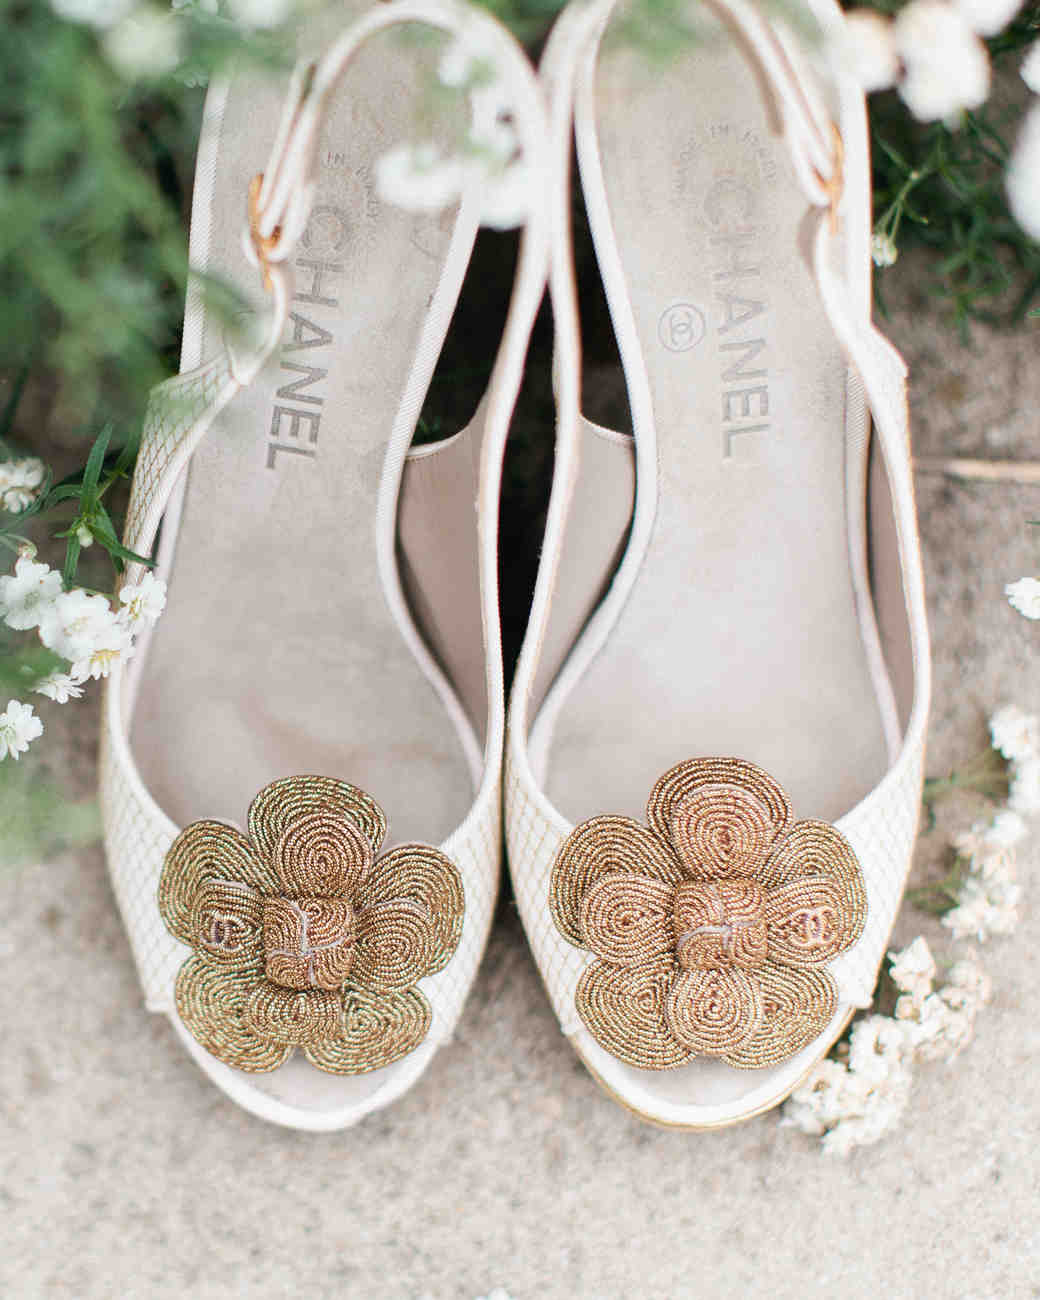 jola-tom-wedding-shoes-0614.jpg